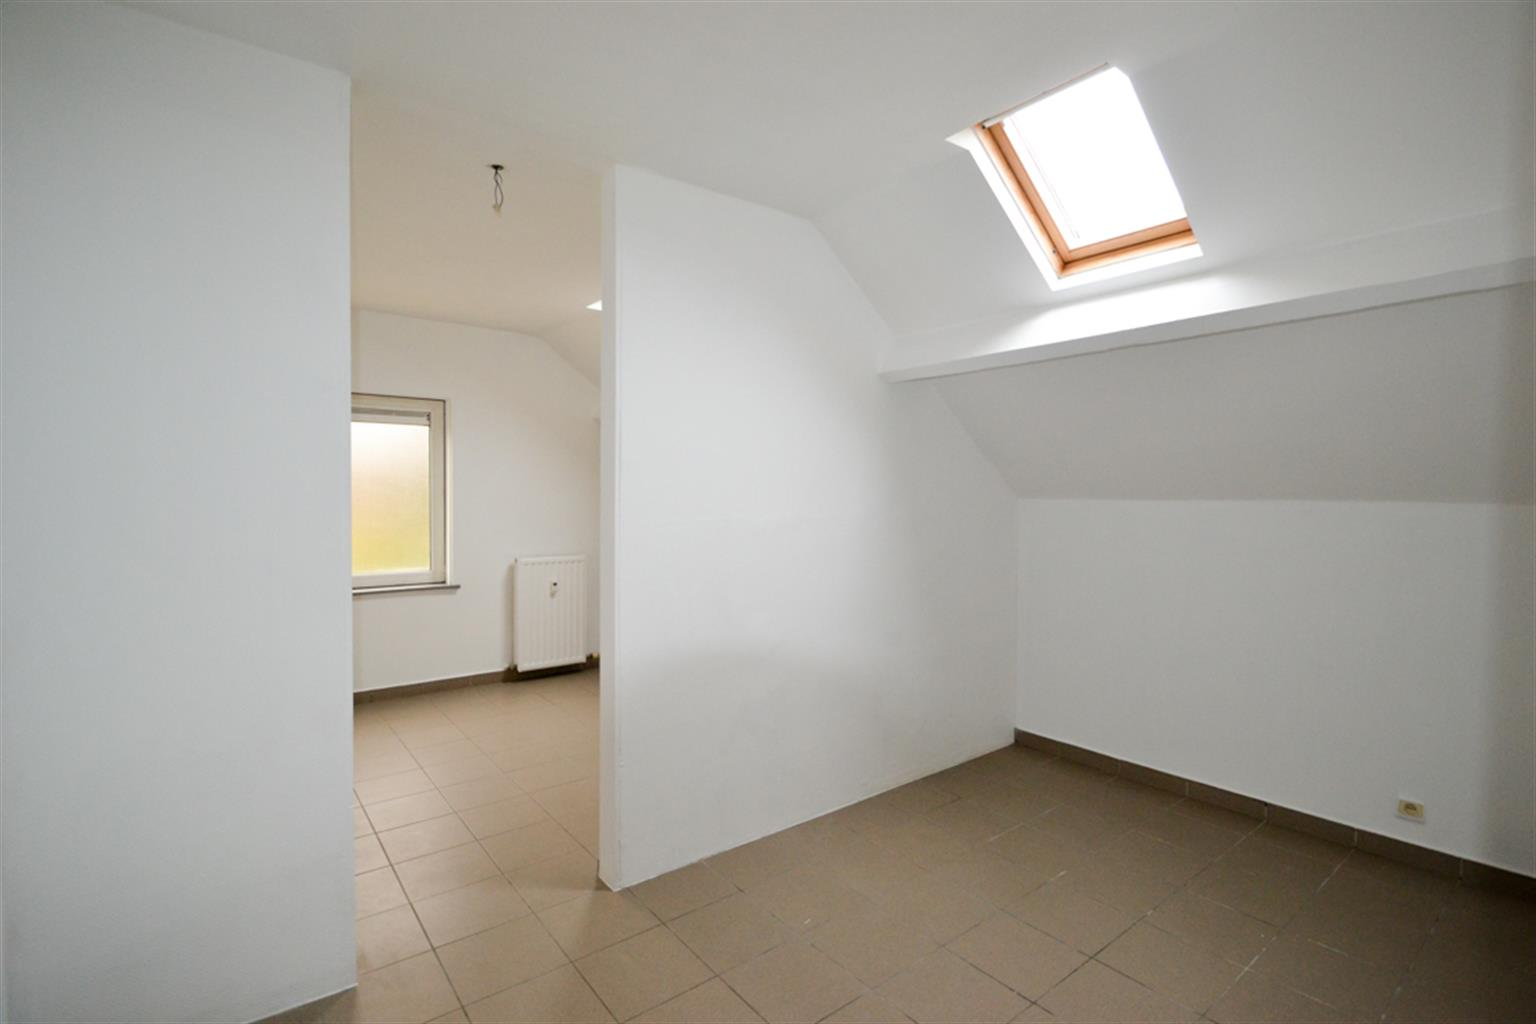 Appartement - Leval-Trahegnies - #3866773-3